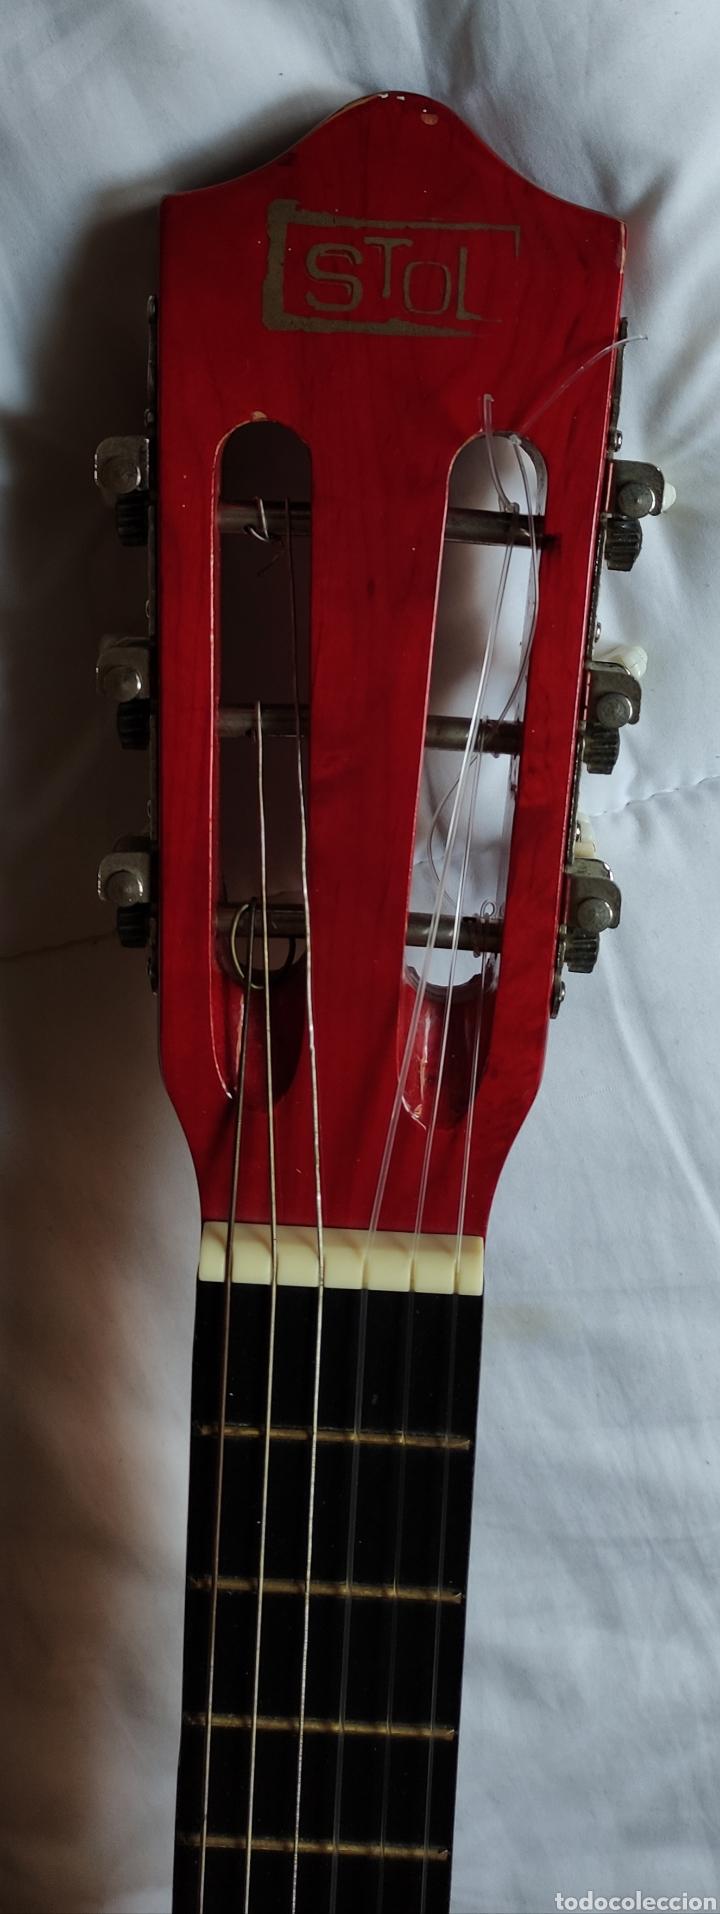 Instrumentos musicales: Guitarra - Foto 3 - 228417015